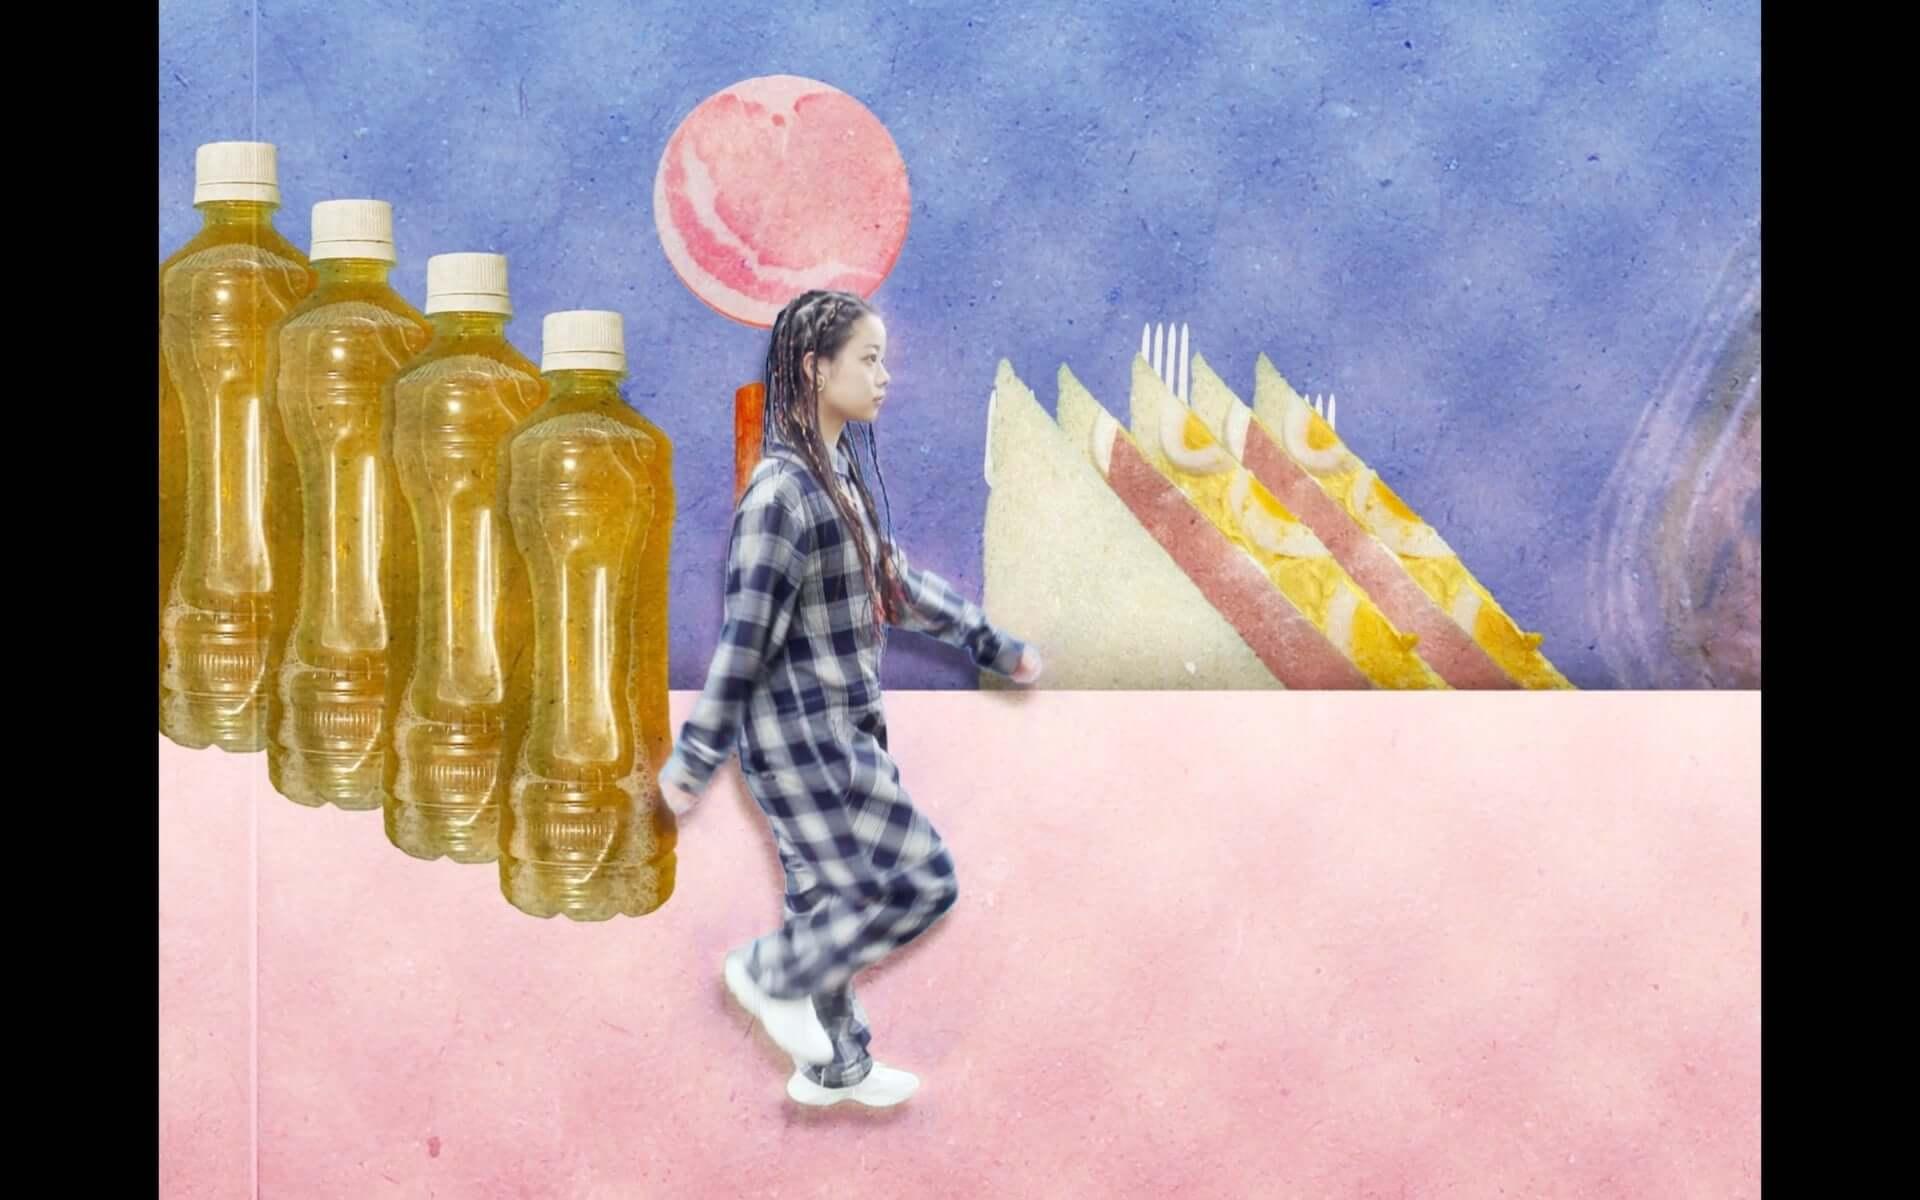 "xiangyuが2nd EP『きき』をデジタルリリース&新曲""BBIISPP""のMVを公開!自主企画<香魚荘#02>も開催決定 music200605_xiangyu_mv_03-1920x1200"